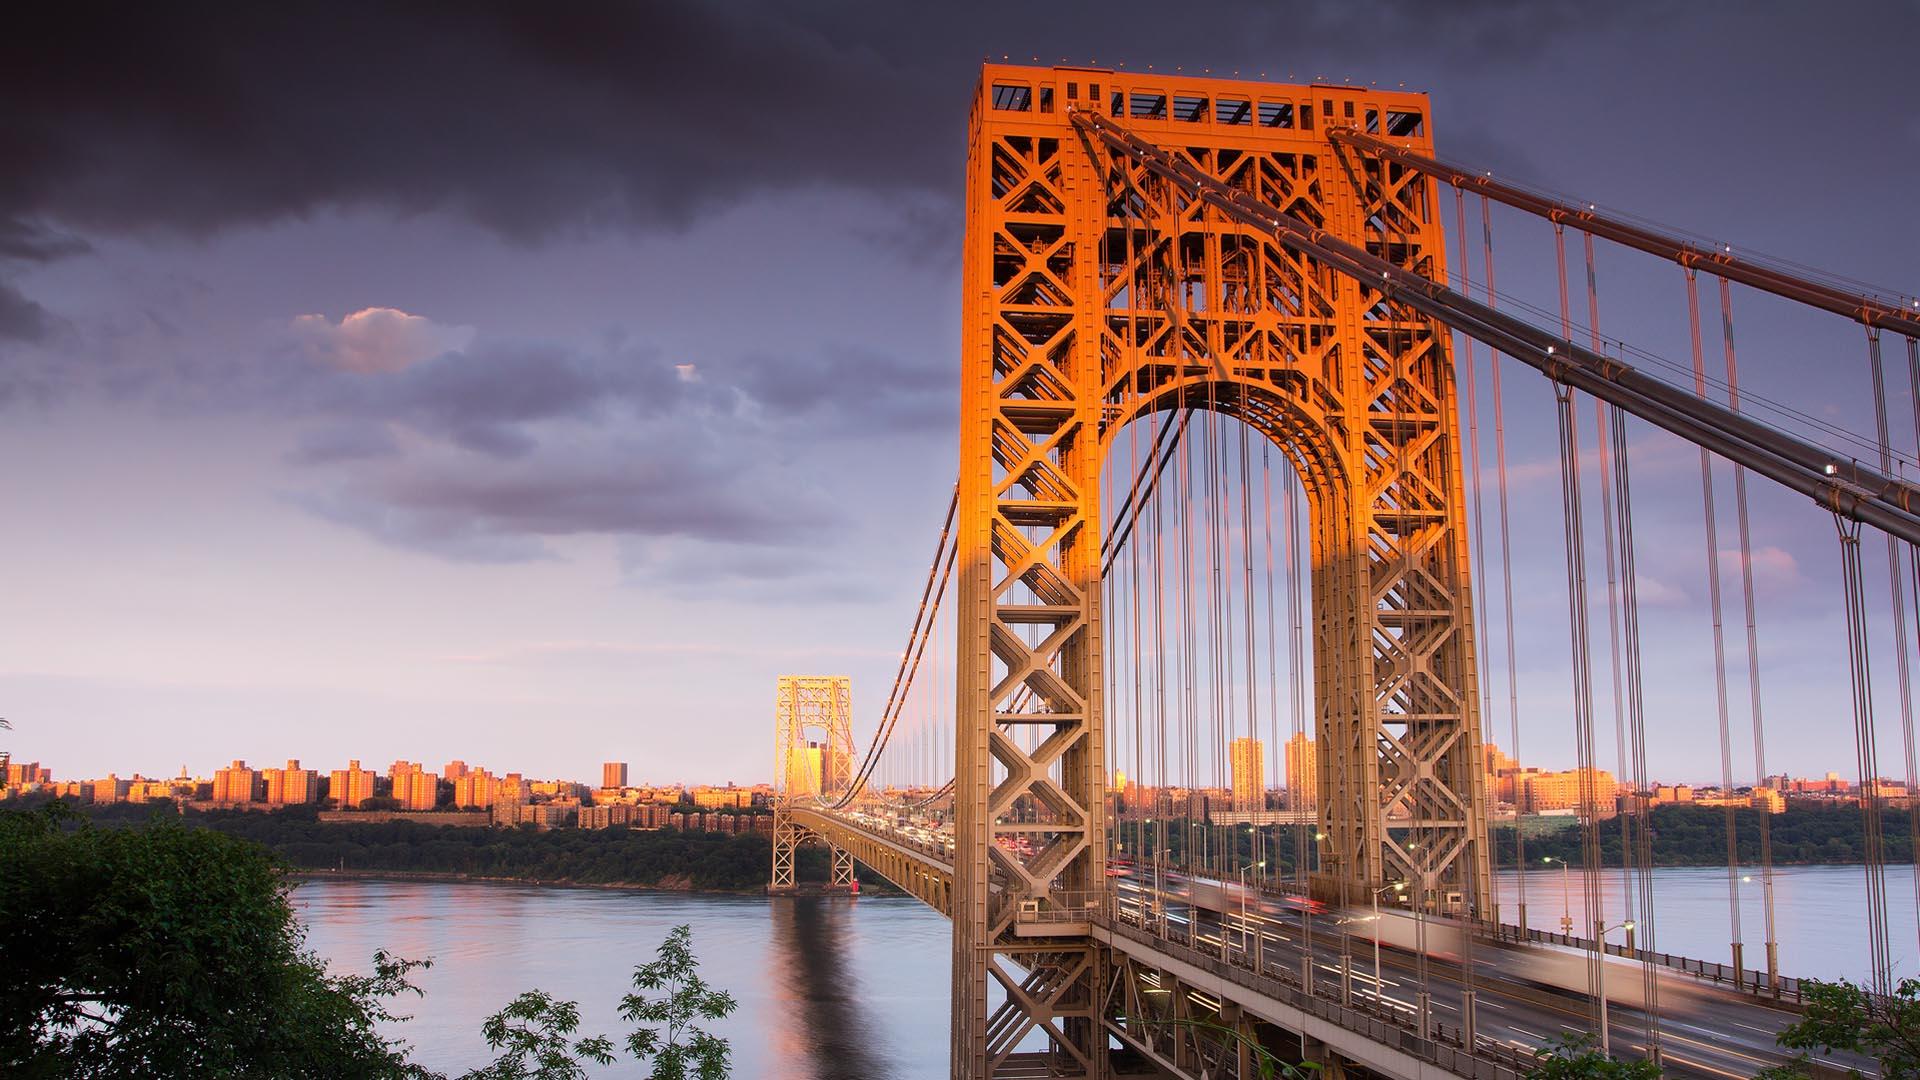 George Washington Bridge HD Wallpaper FullHDWpp   Full HD 1920x1080